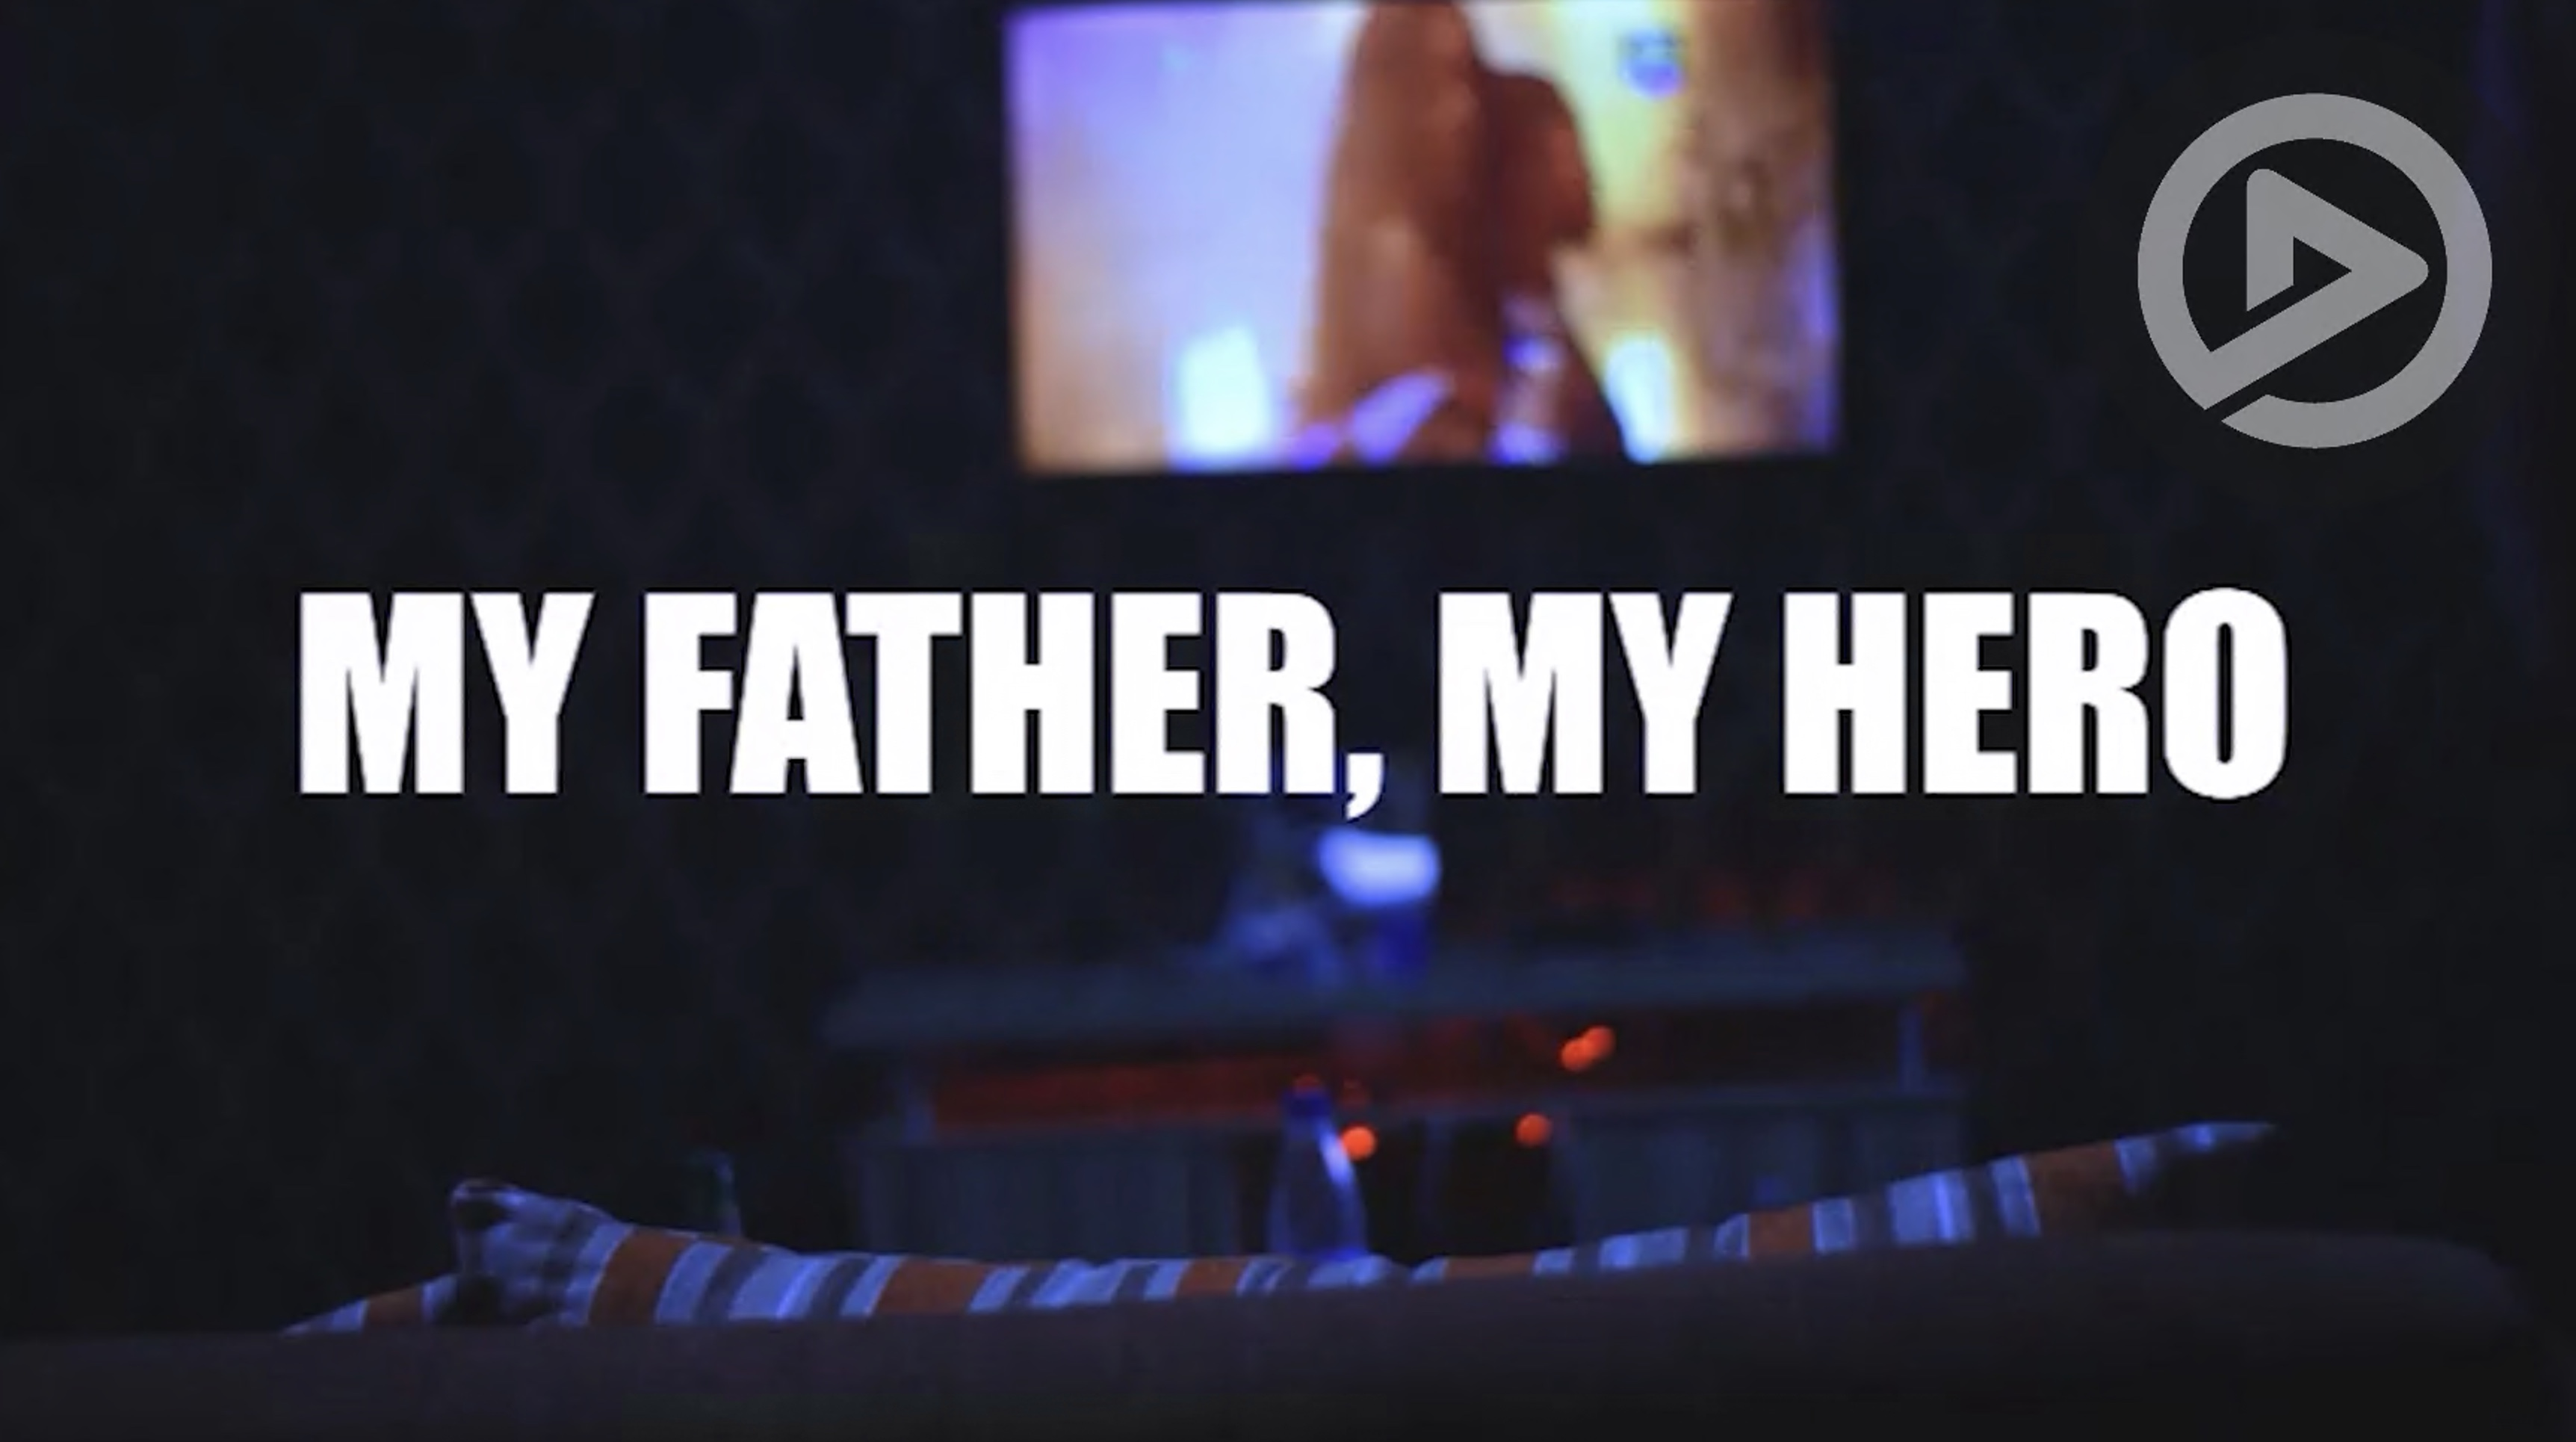 My father my hero